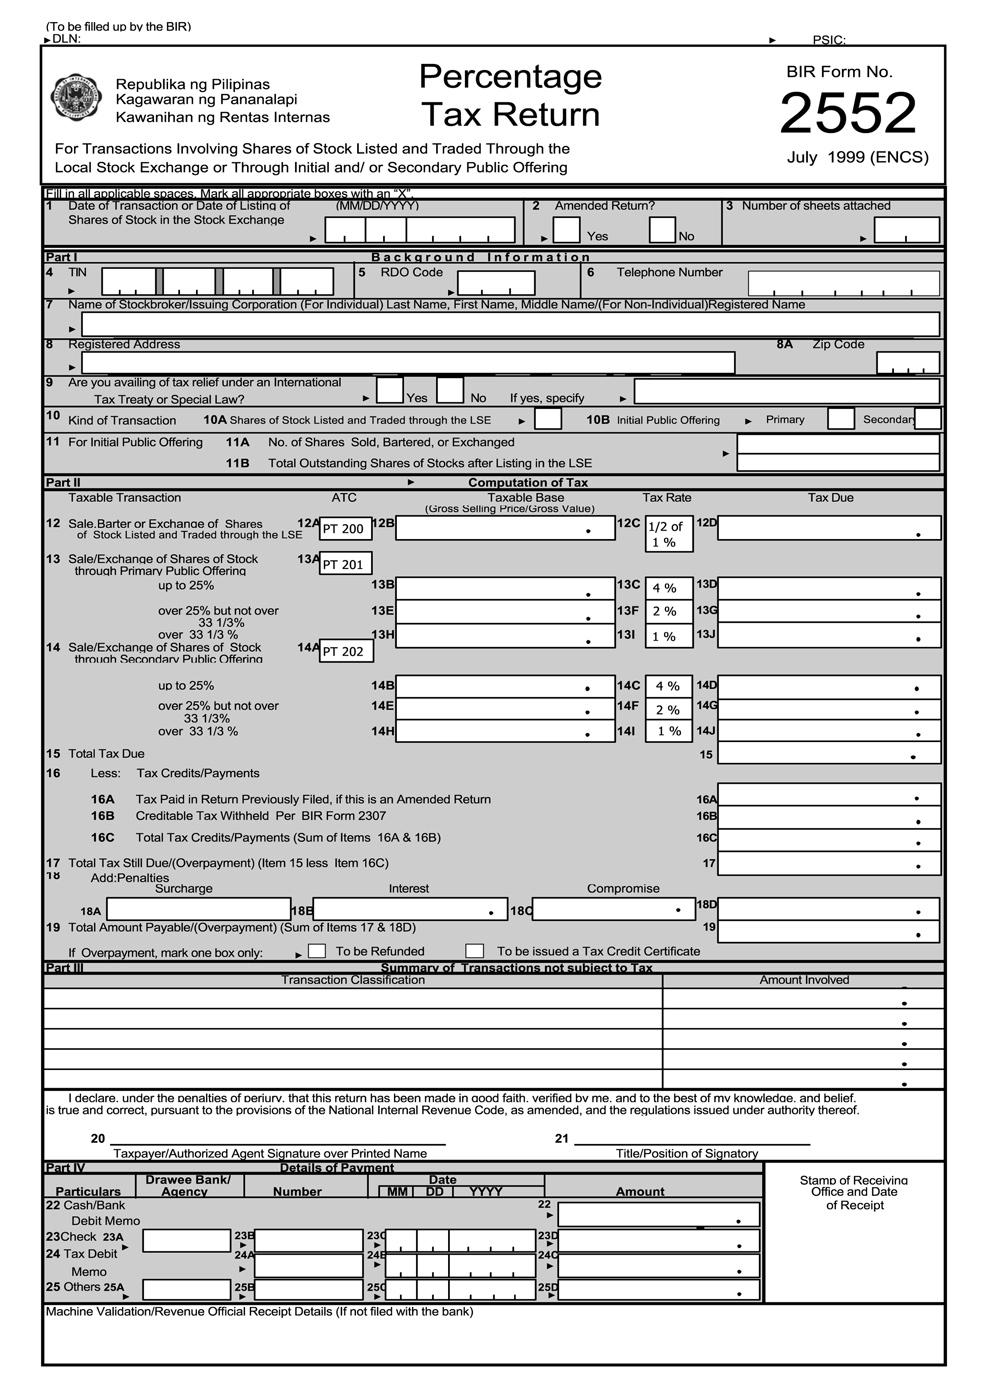 busapcom: BIR Form 2552 Download